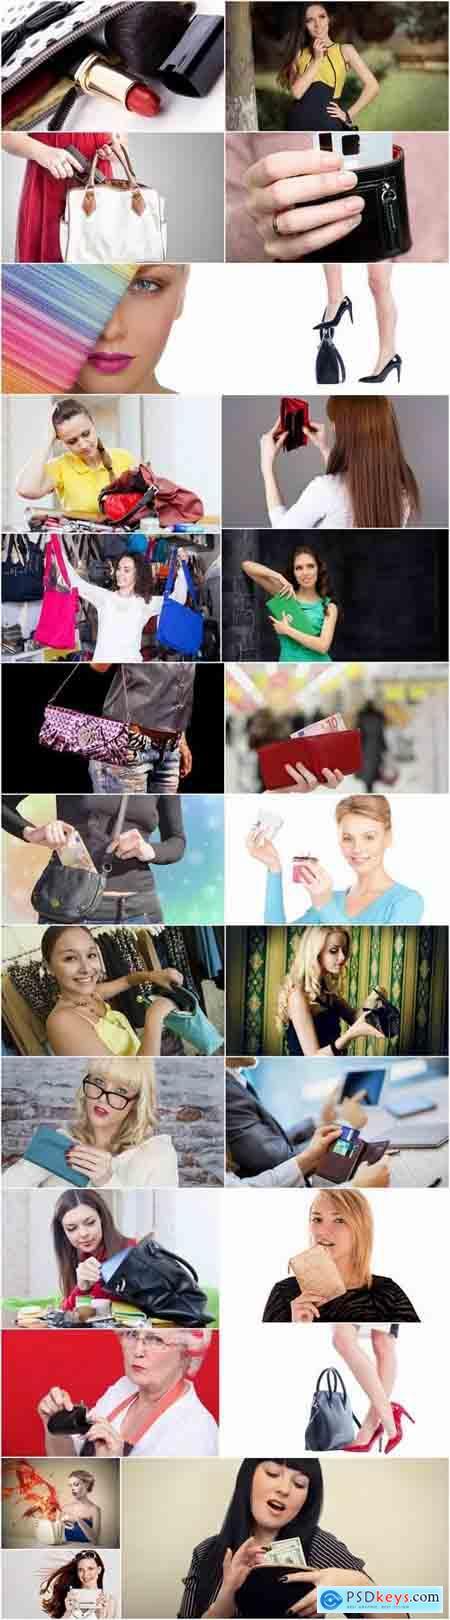 Purse bag luggage girl woman shopping 25 HQ Jpeg